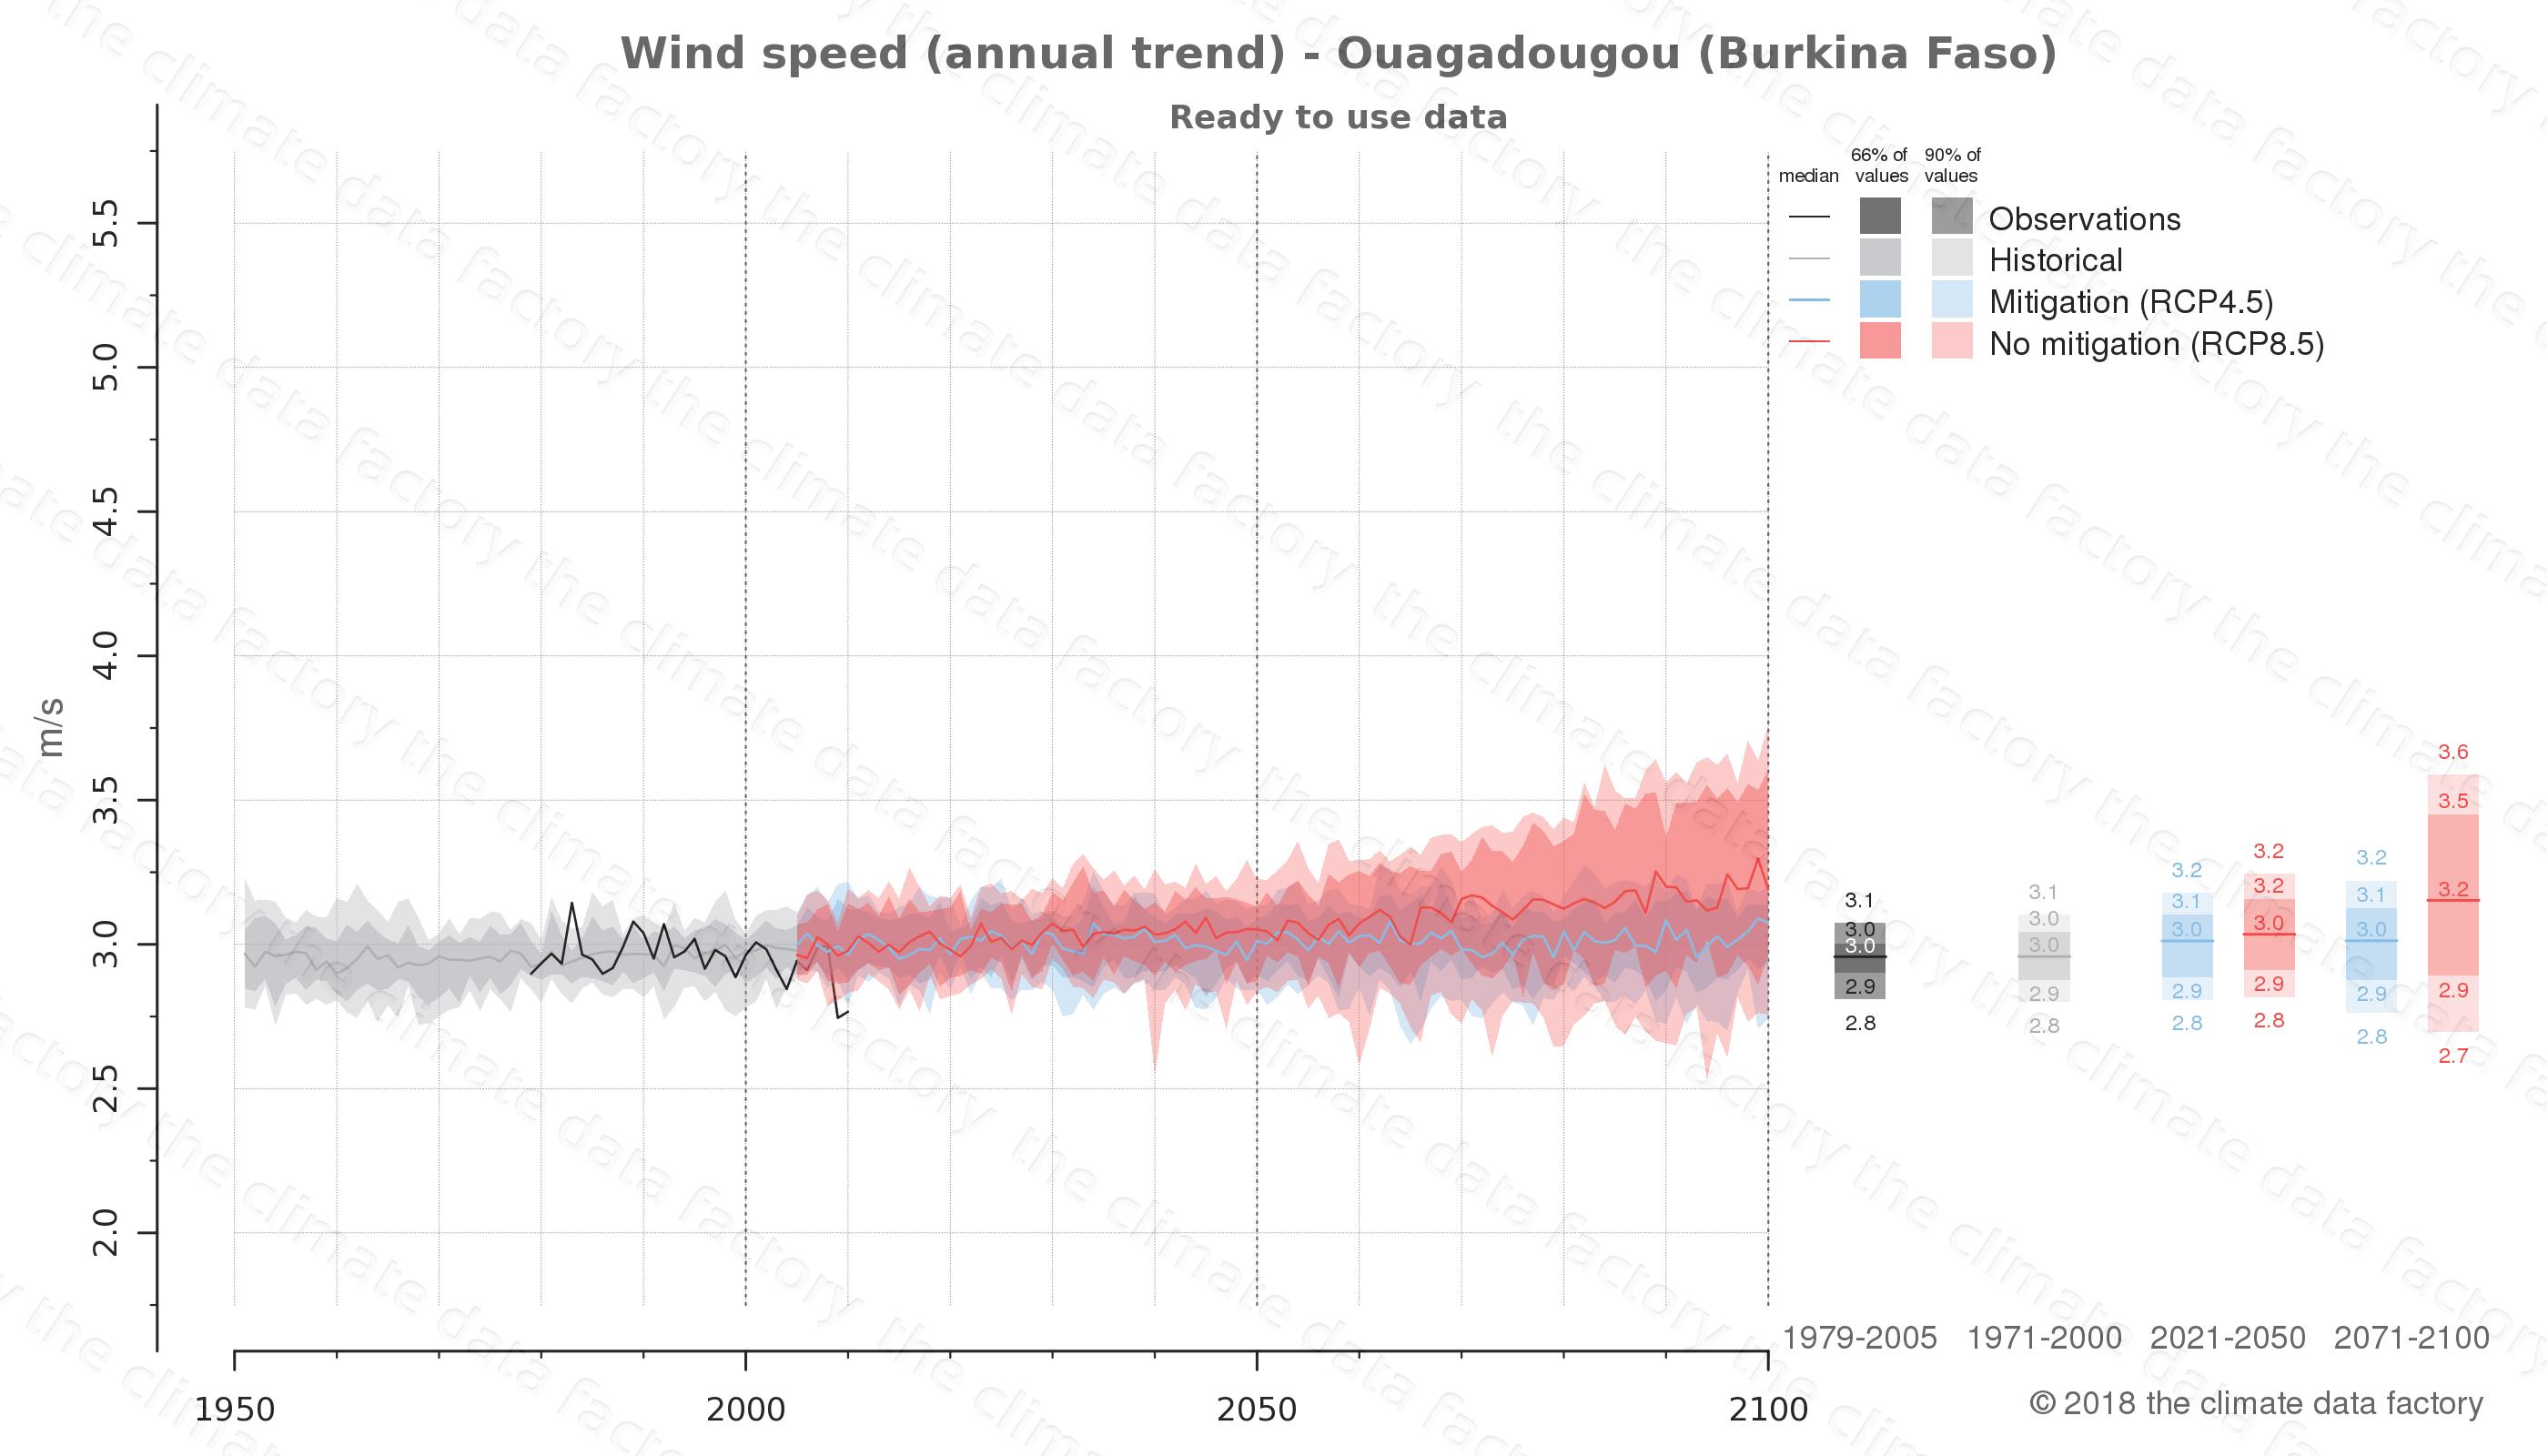 climate change data policy adaptation climate graph city data wind-speed ouagadougou burkina faso